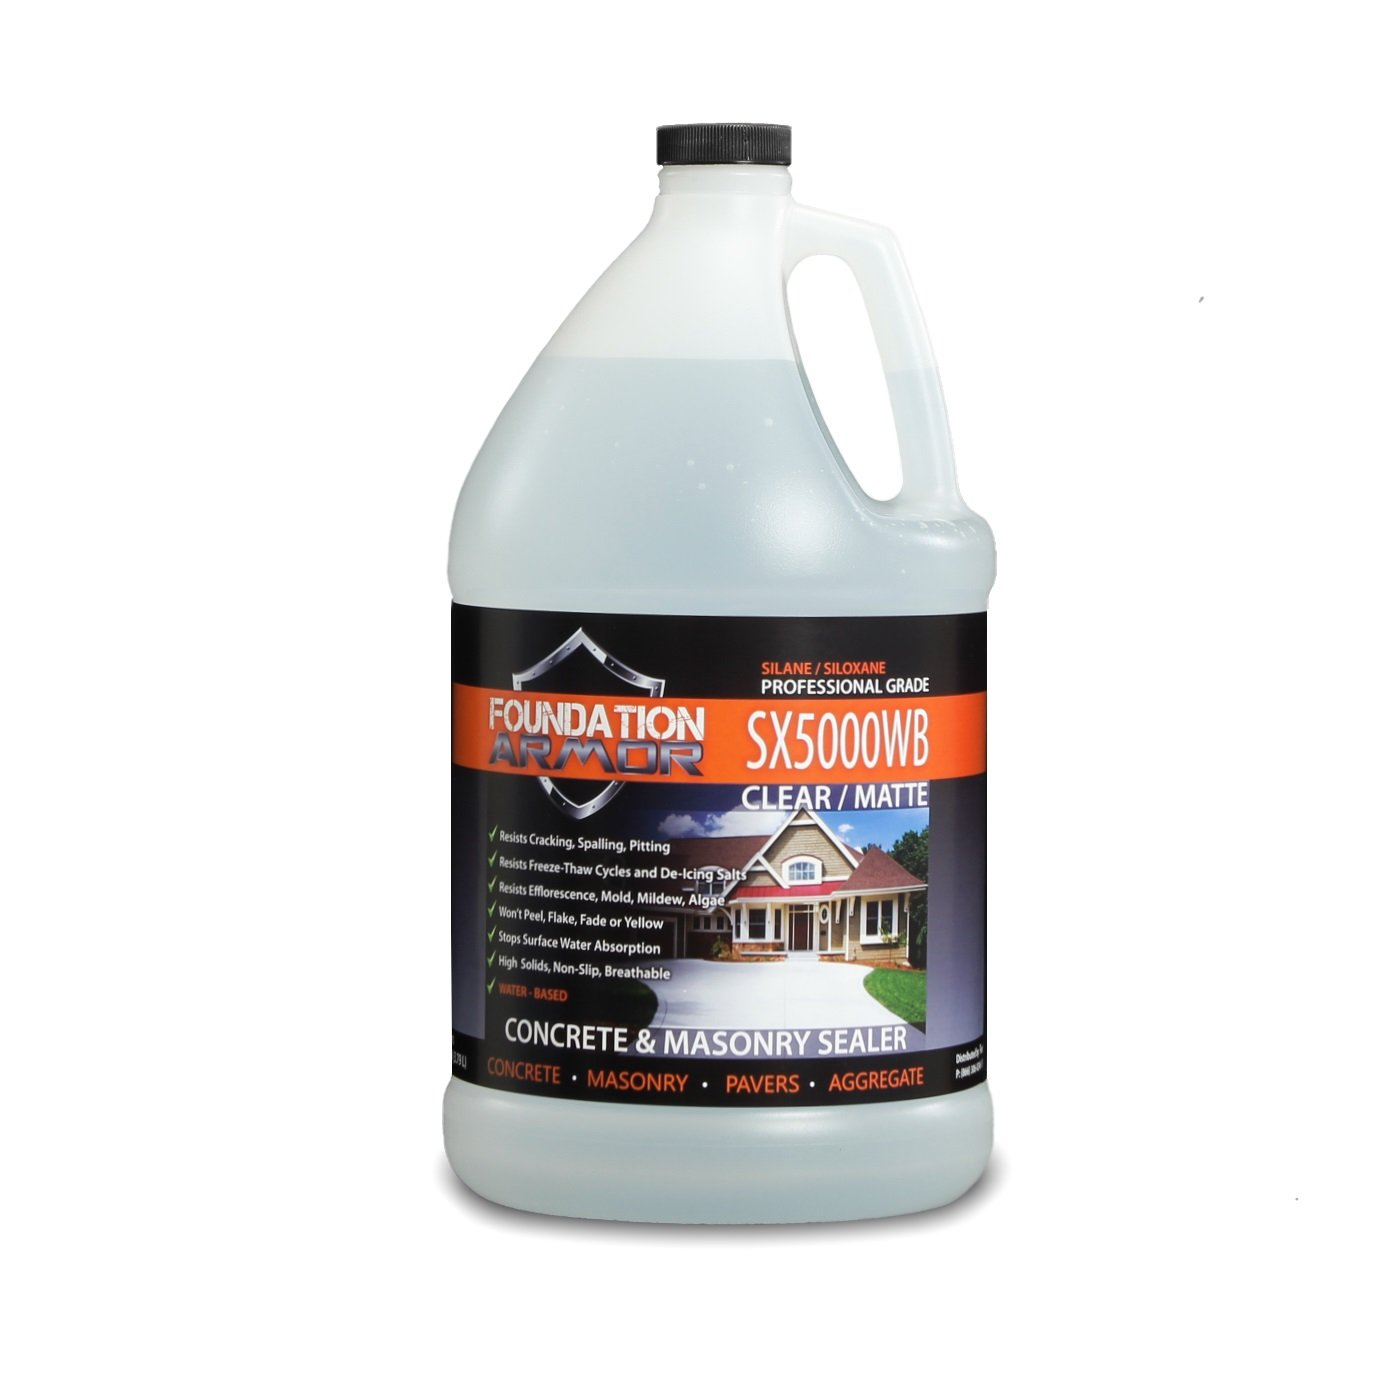 Armor SX5000 WB DOT Approved Deep Penetrating Water Based Silane Siloxane Concrete Sealer, Brick Sealer, Paver Sealer, and Water Repellent Sealer Salt Guard